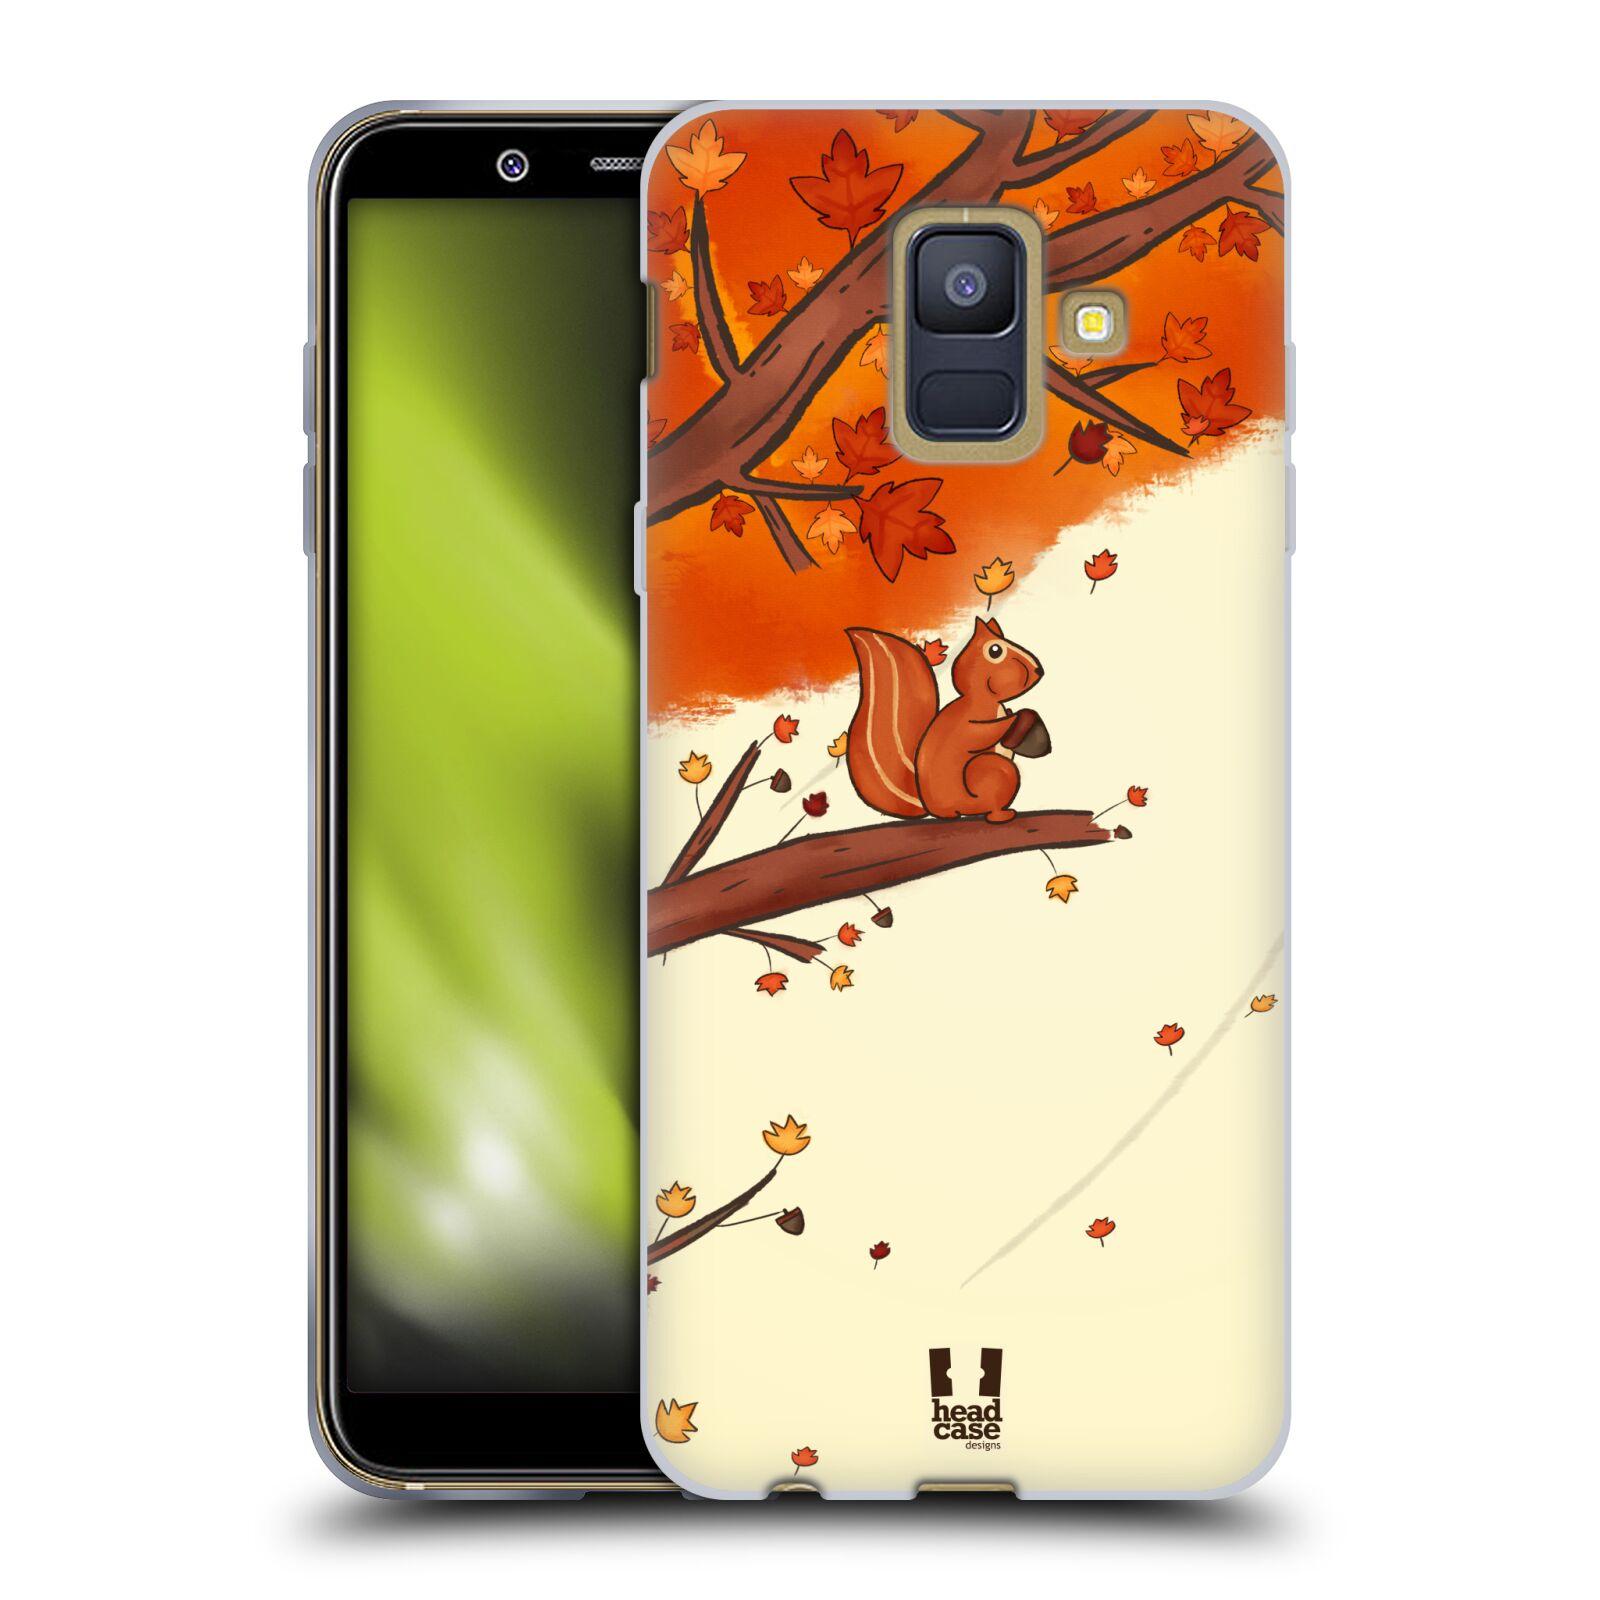 Silikonové pouzdro na mobil Samsung Galaxy A6 (2018) - Head Case - PODZIMNÍ VEVERKA